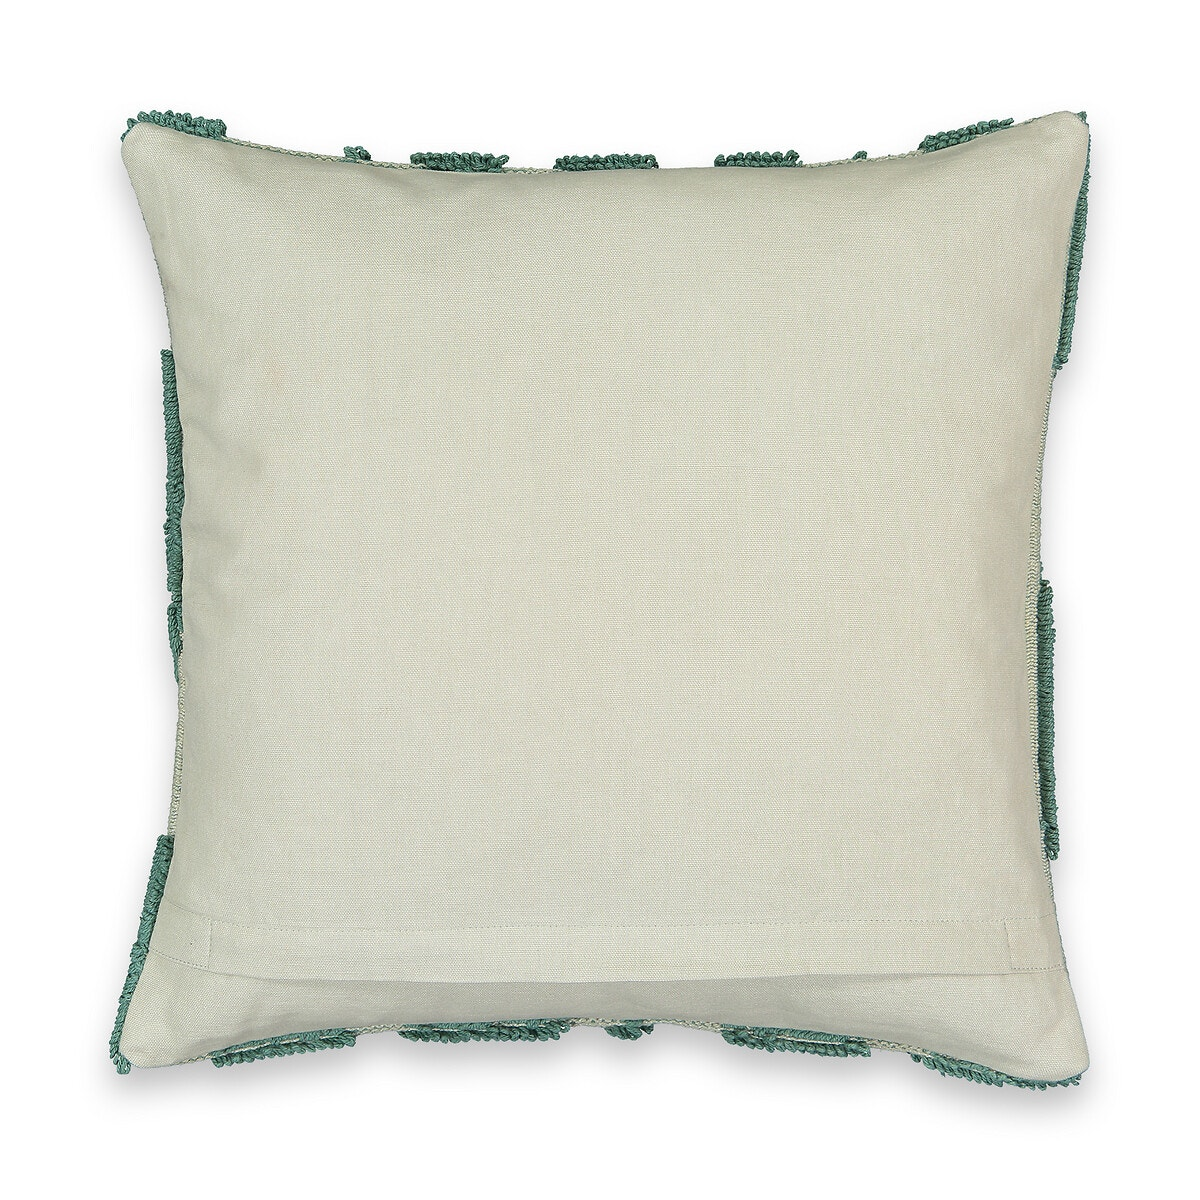 Mint Cushion Cover